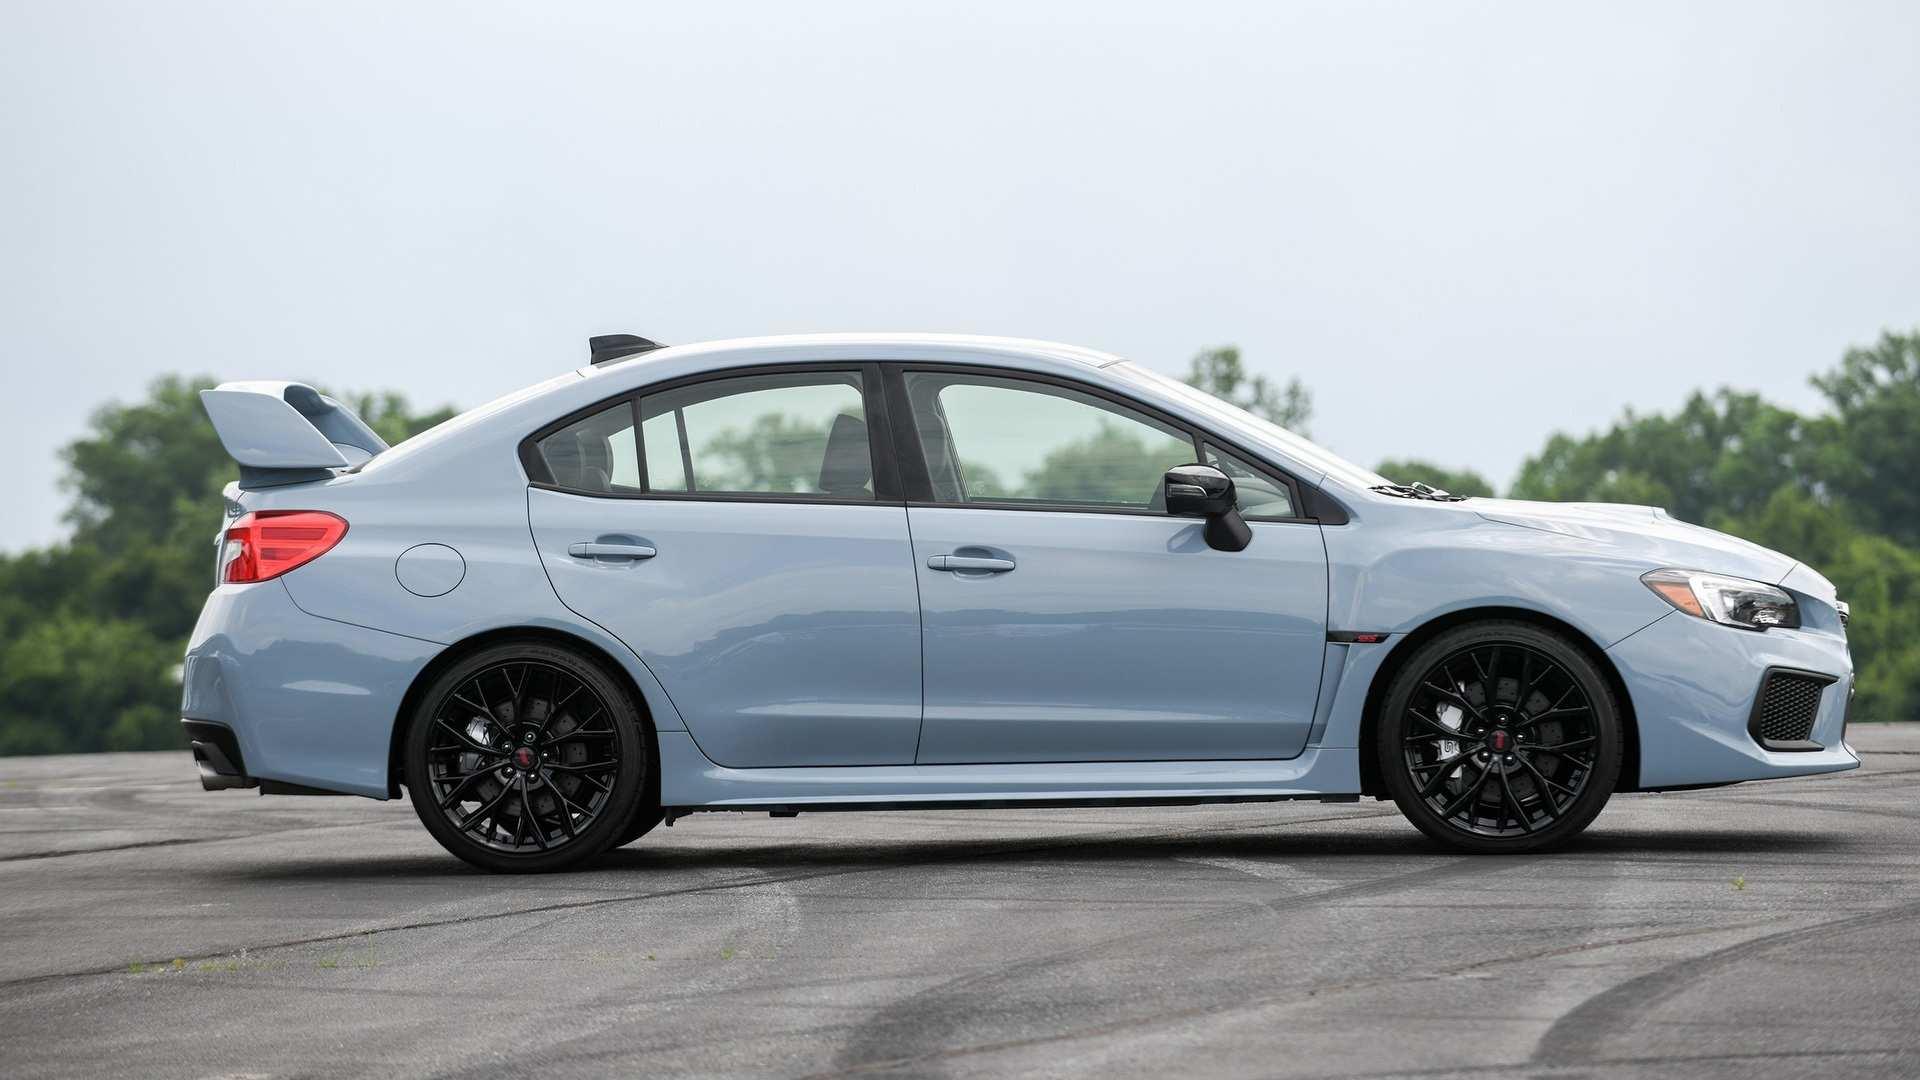 75 All New New Subaru Sti 2019 Youtube Review Configurations for New Subaru Sti 2019 Youtube Review